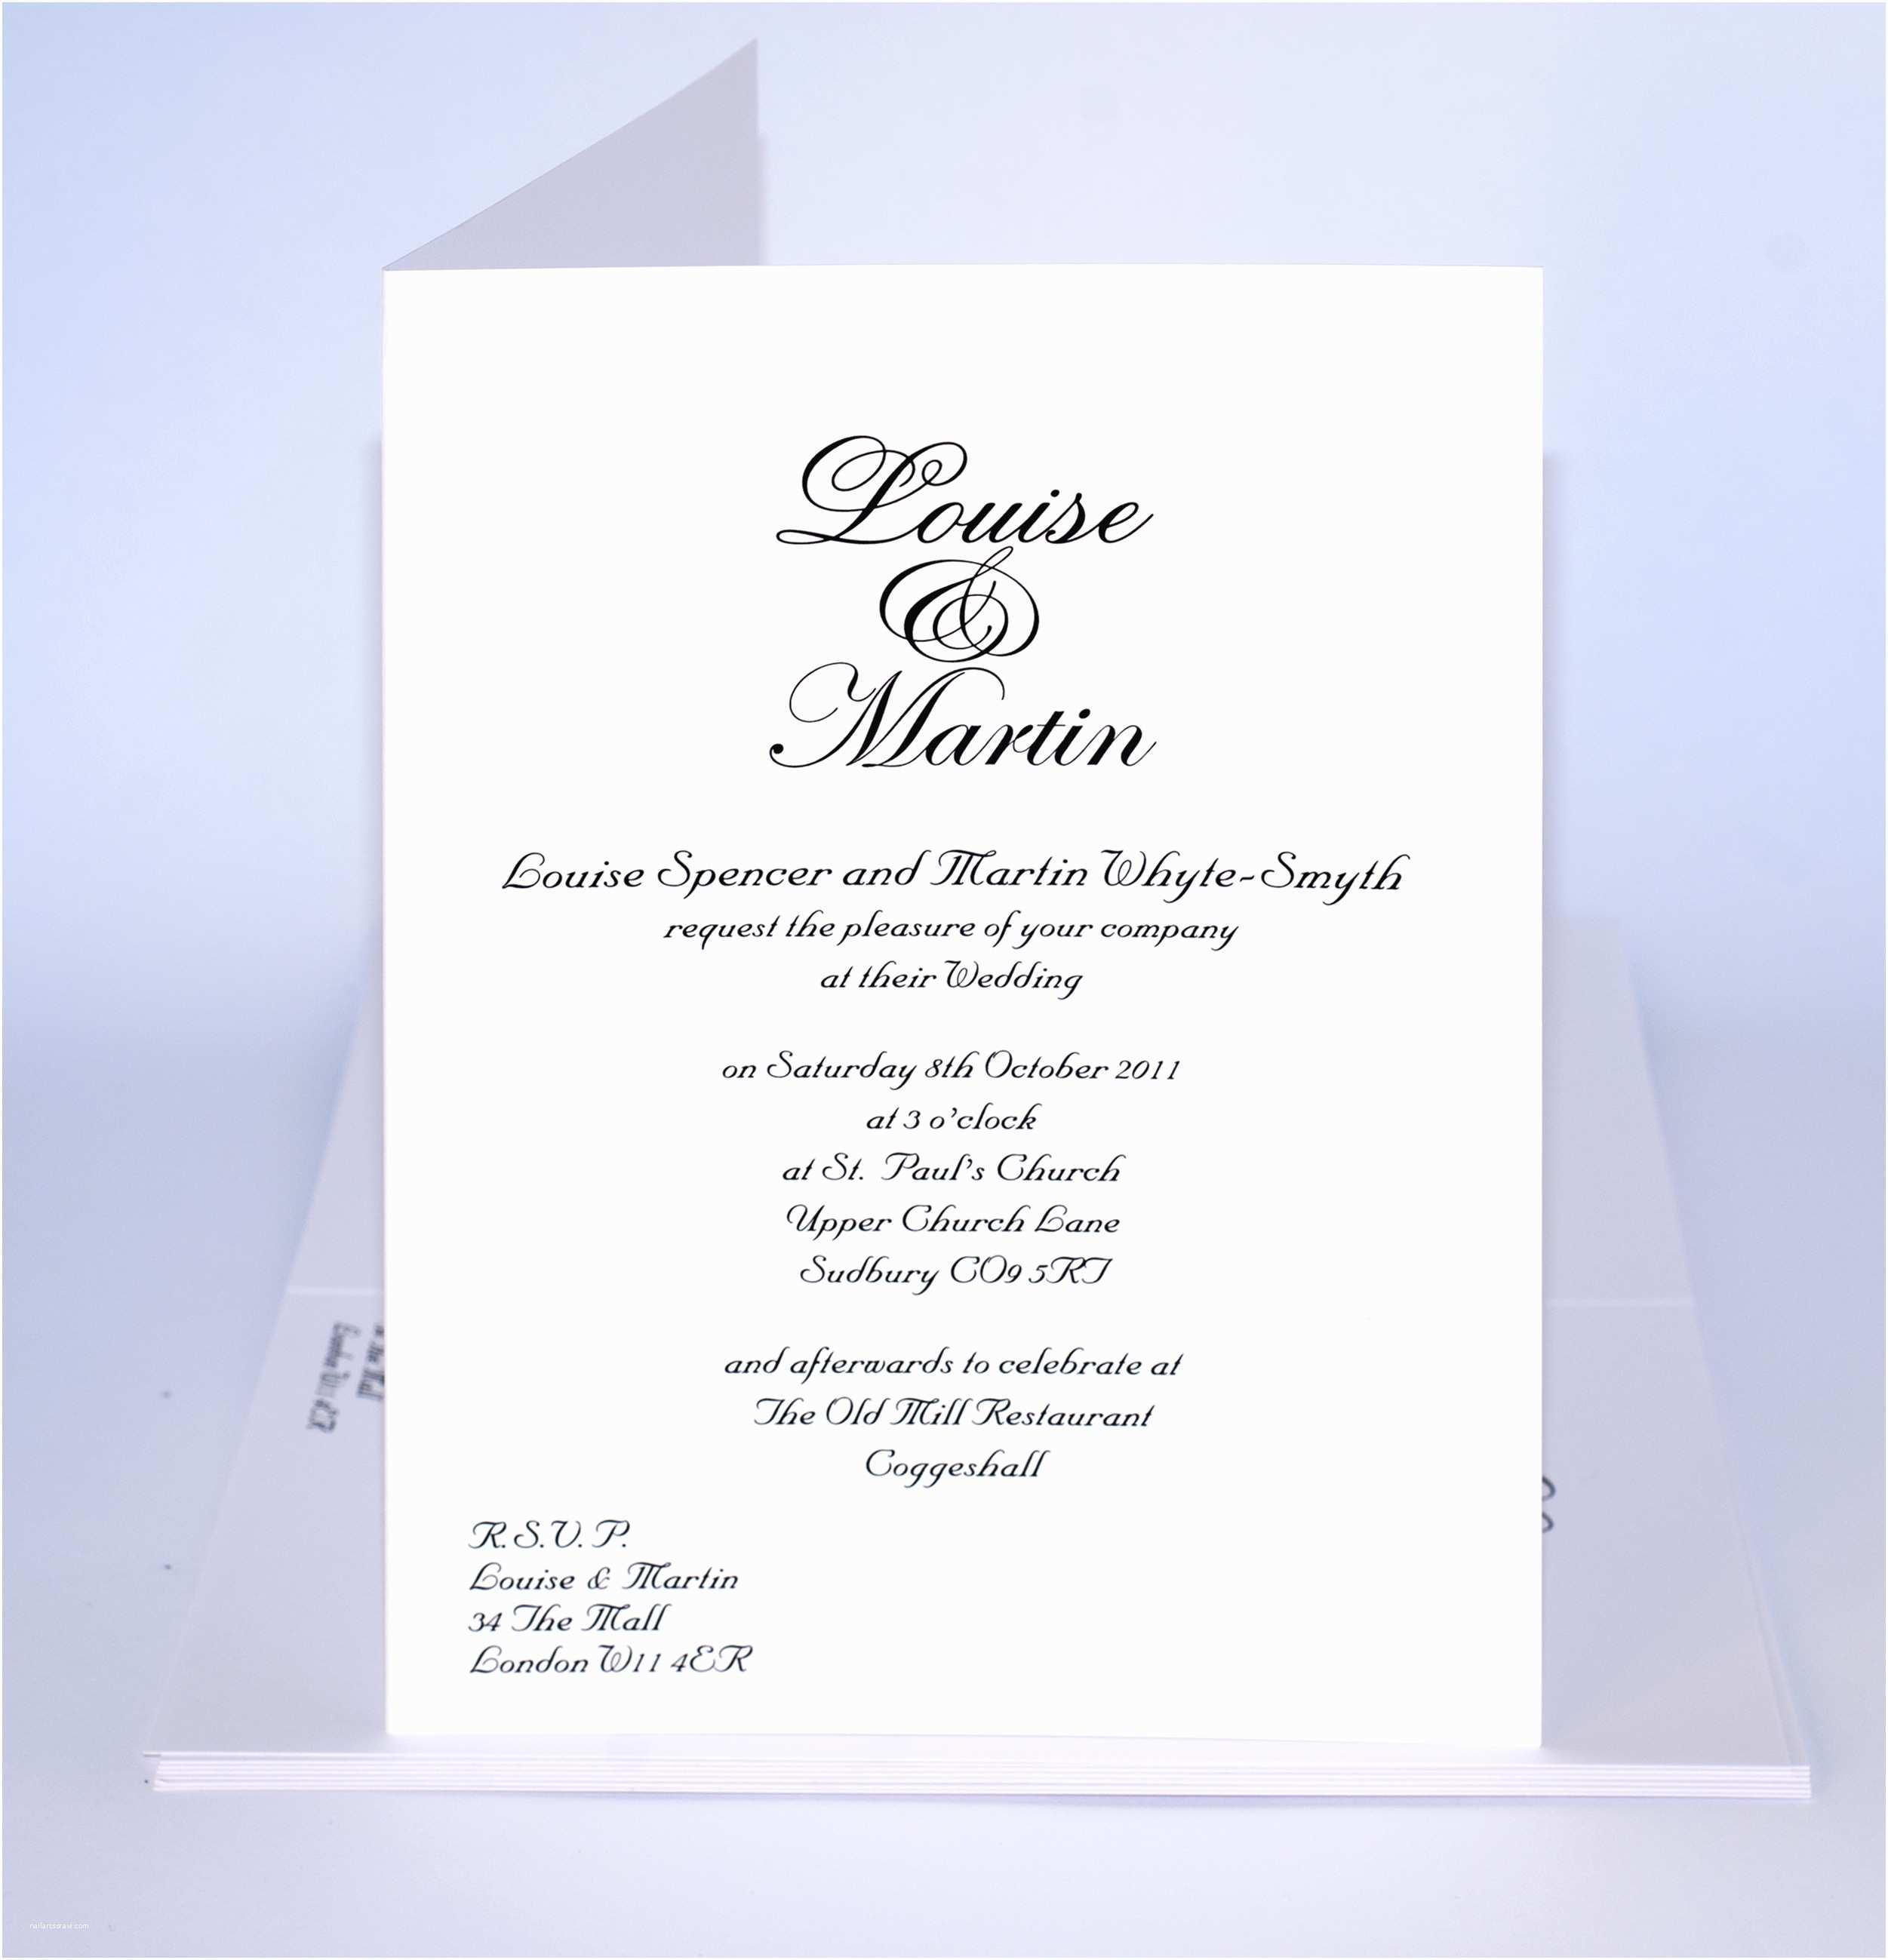 Sample Wedding Invitations Wedding Invitation Wording Wedding Invitation Templates